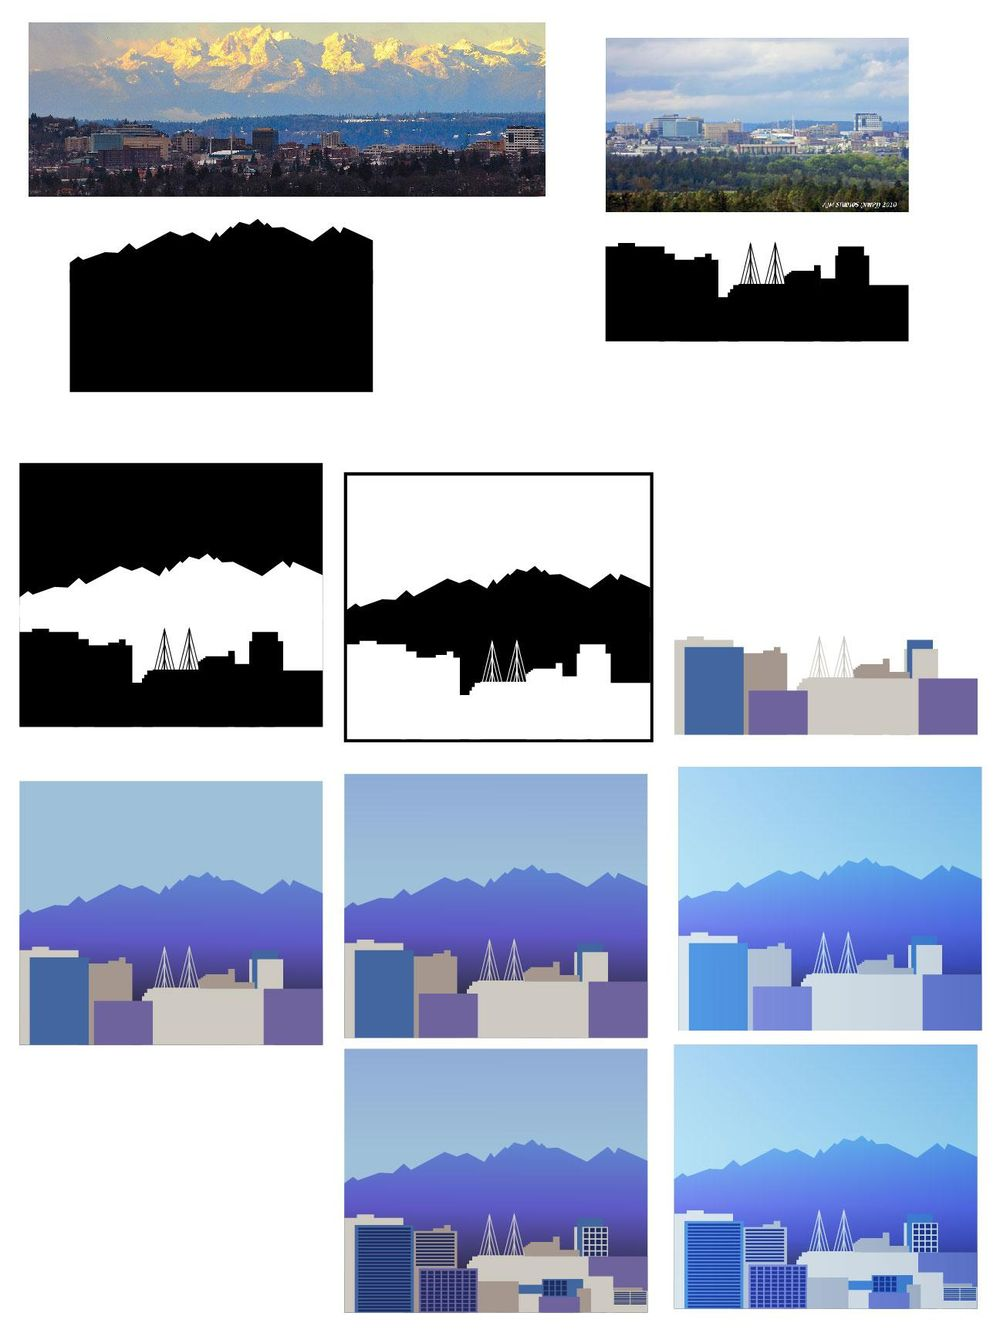 Everett WA and I - image 2 - student project